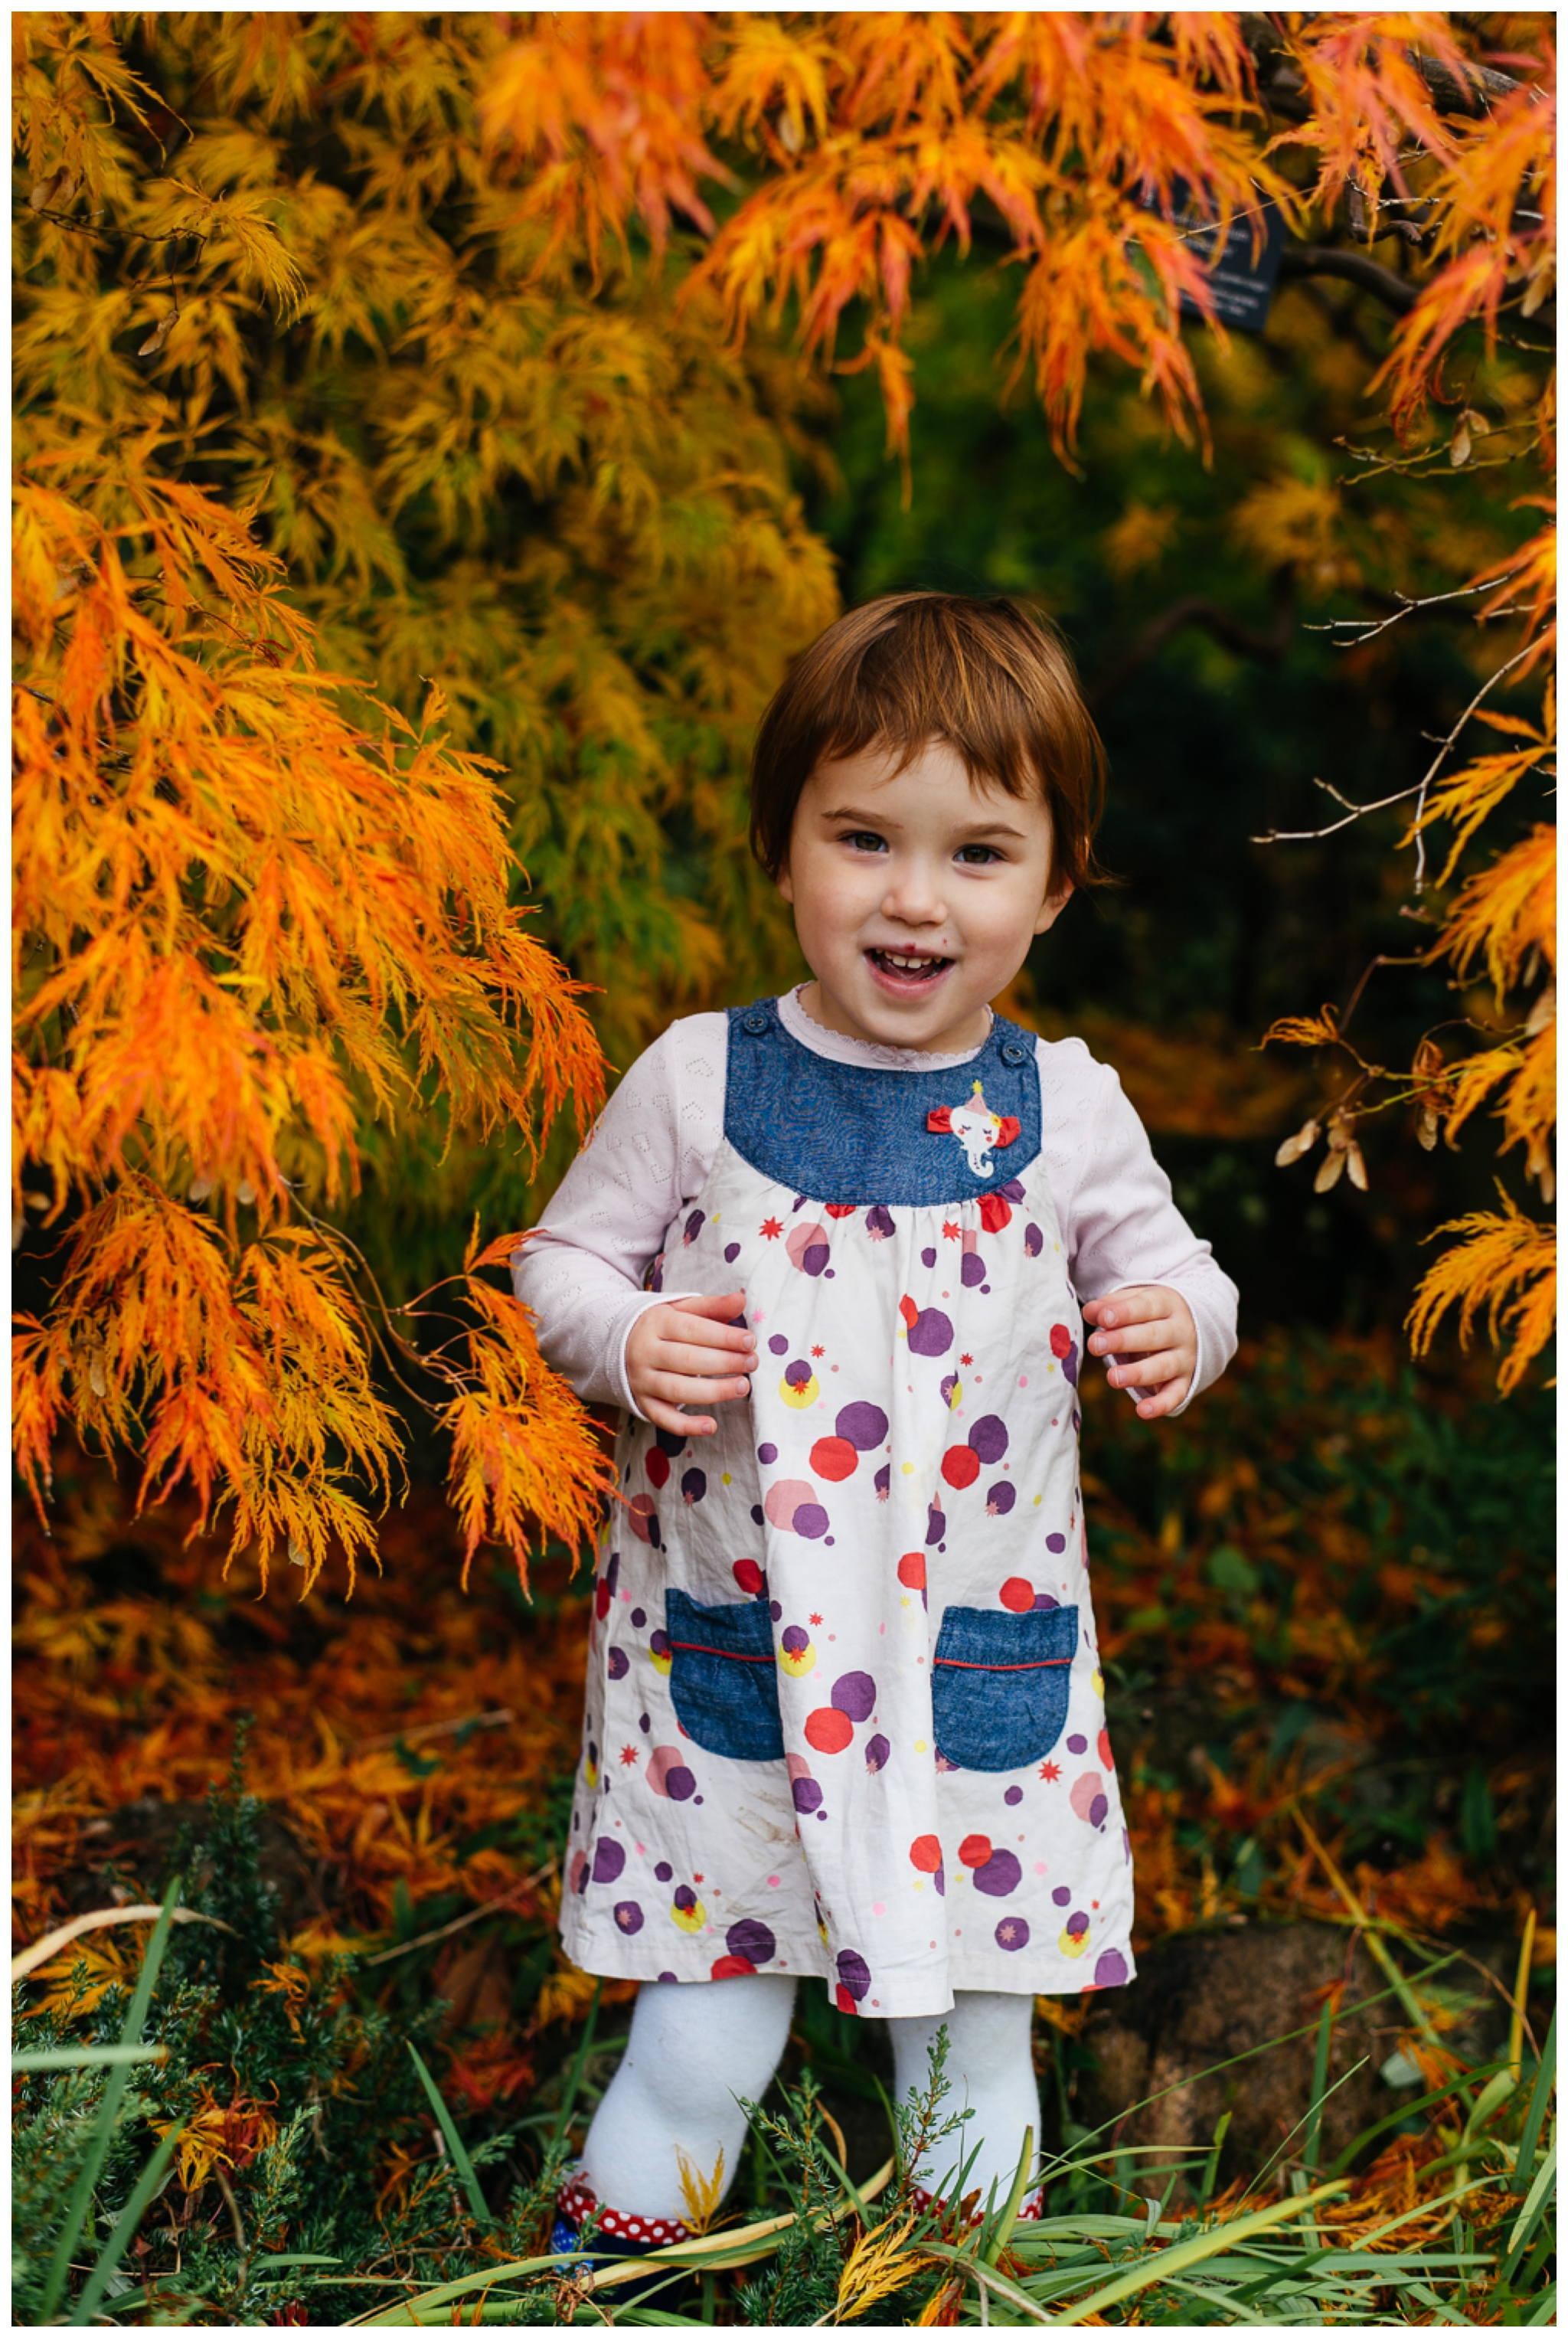 Autumn-family-portraits-birmingham-photographer_0040.jpg